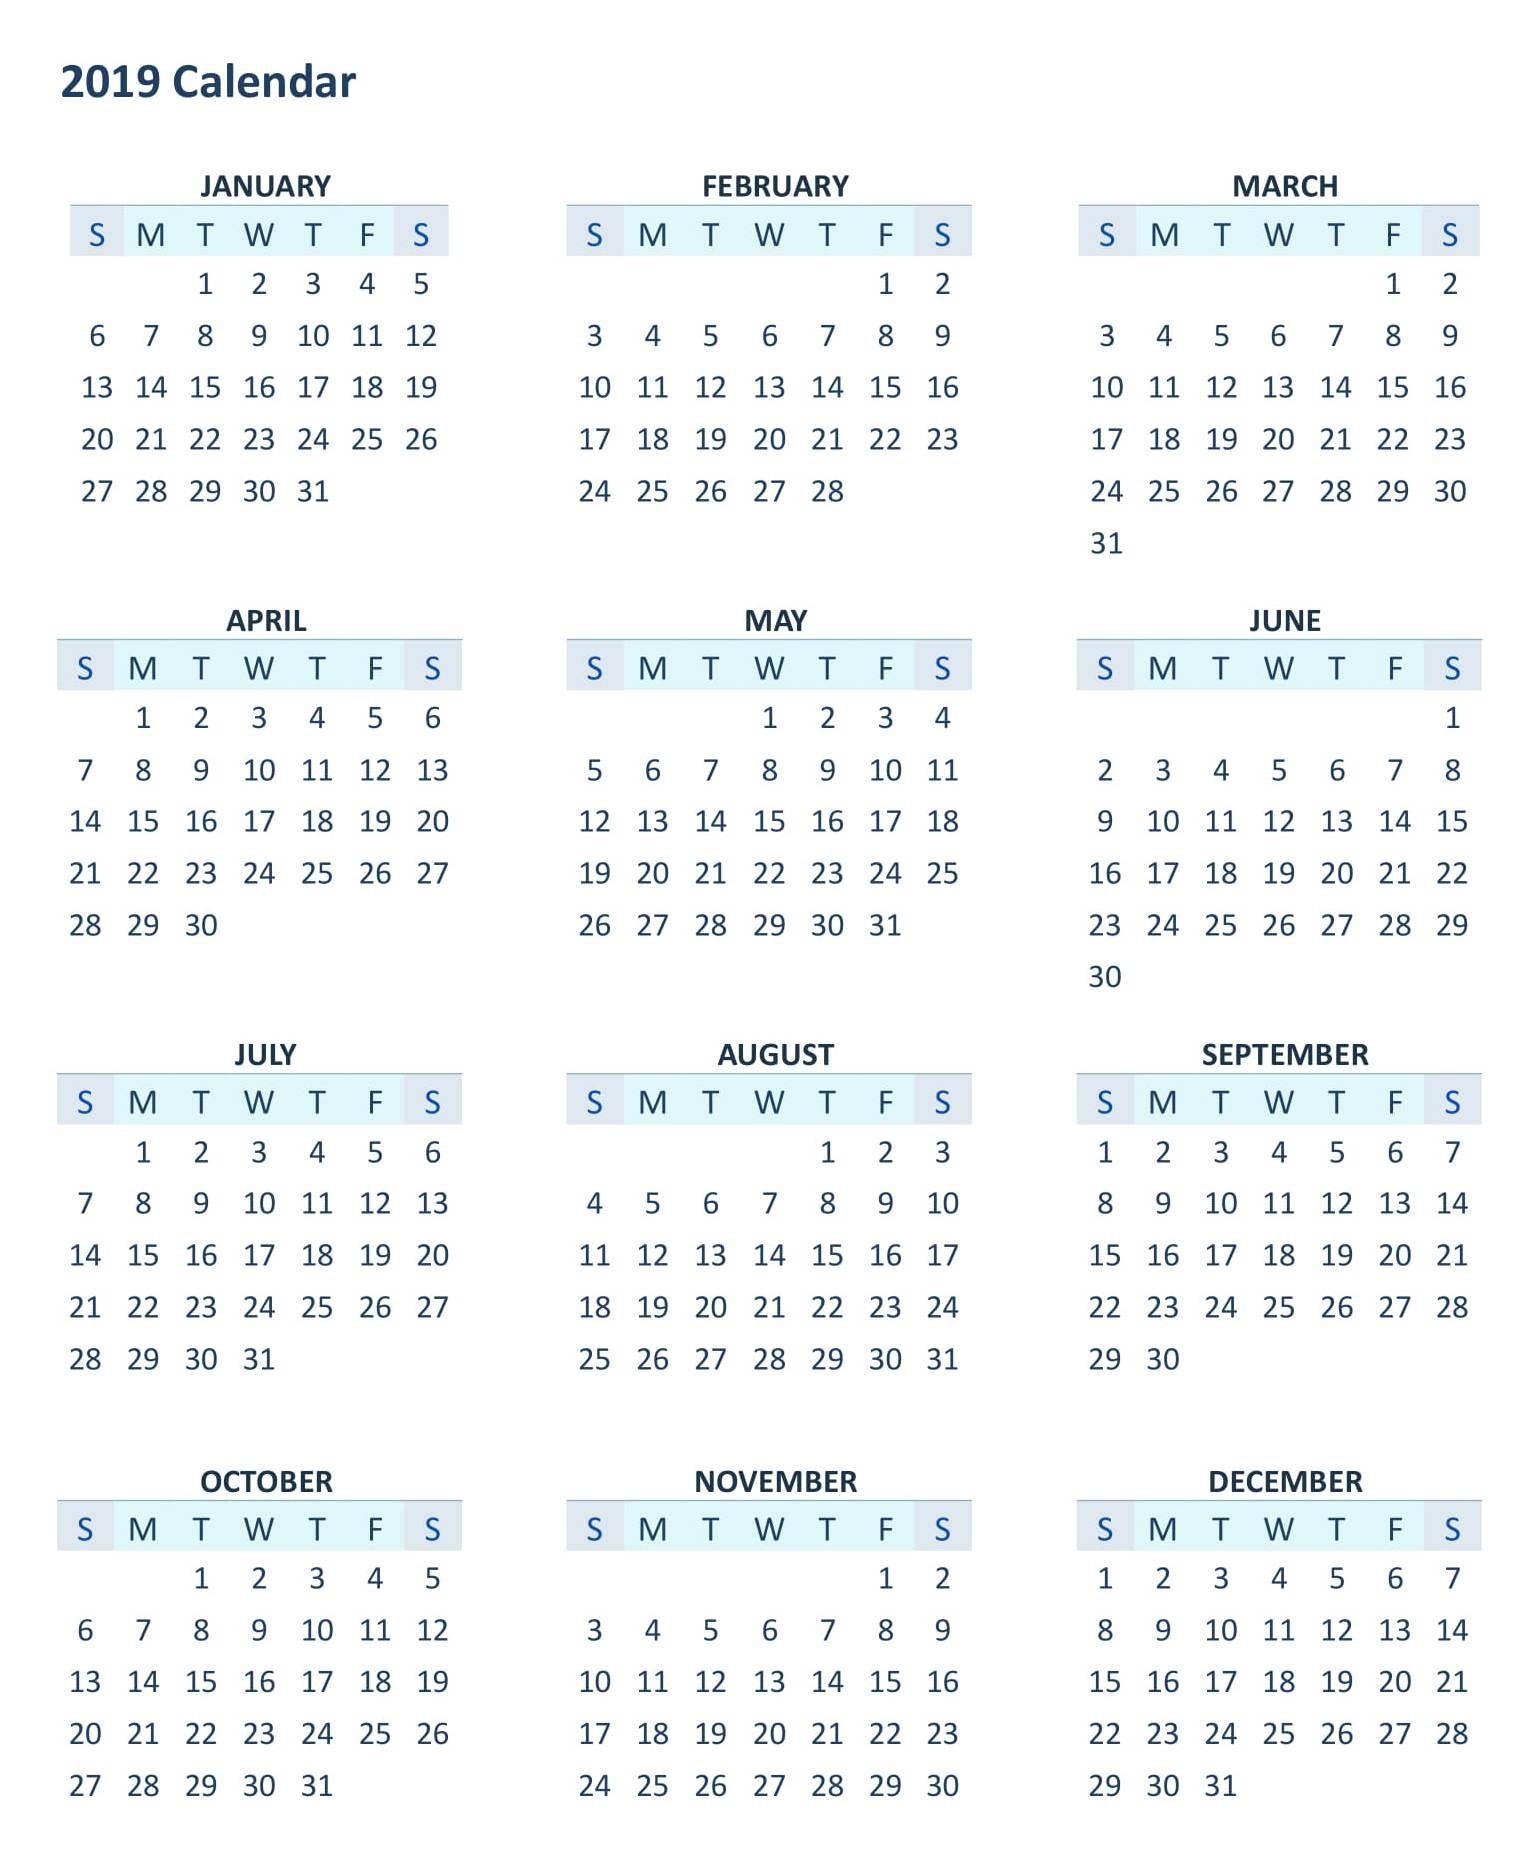 005 Month Calendar Template Ic Any Year Bqvbng Amazing 12 Ideas 2019 with 12 Month Calendar Template Printable